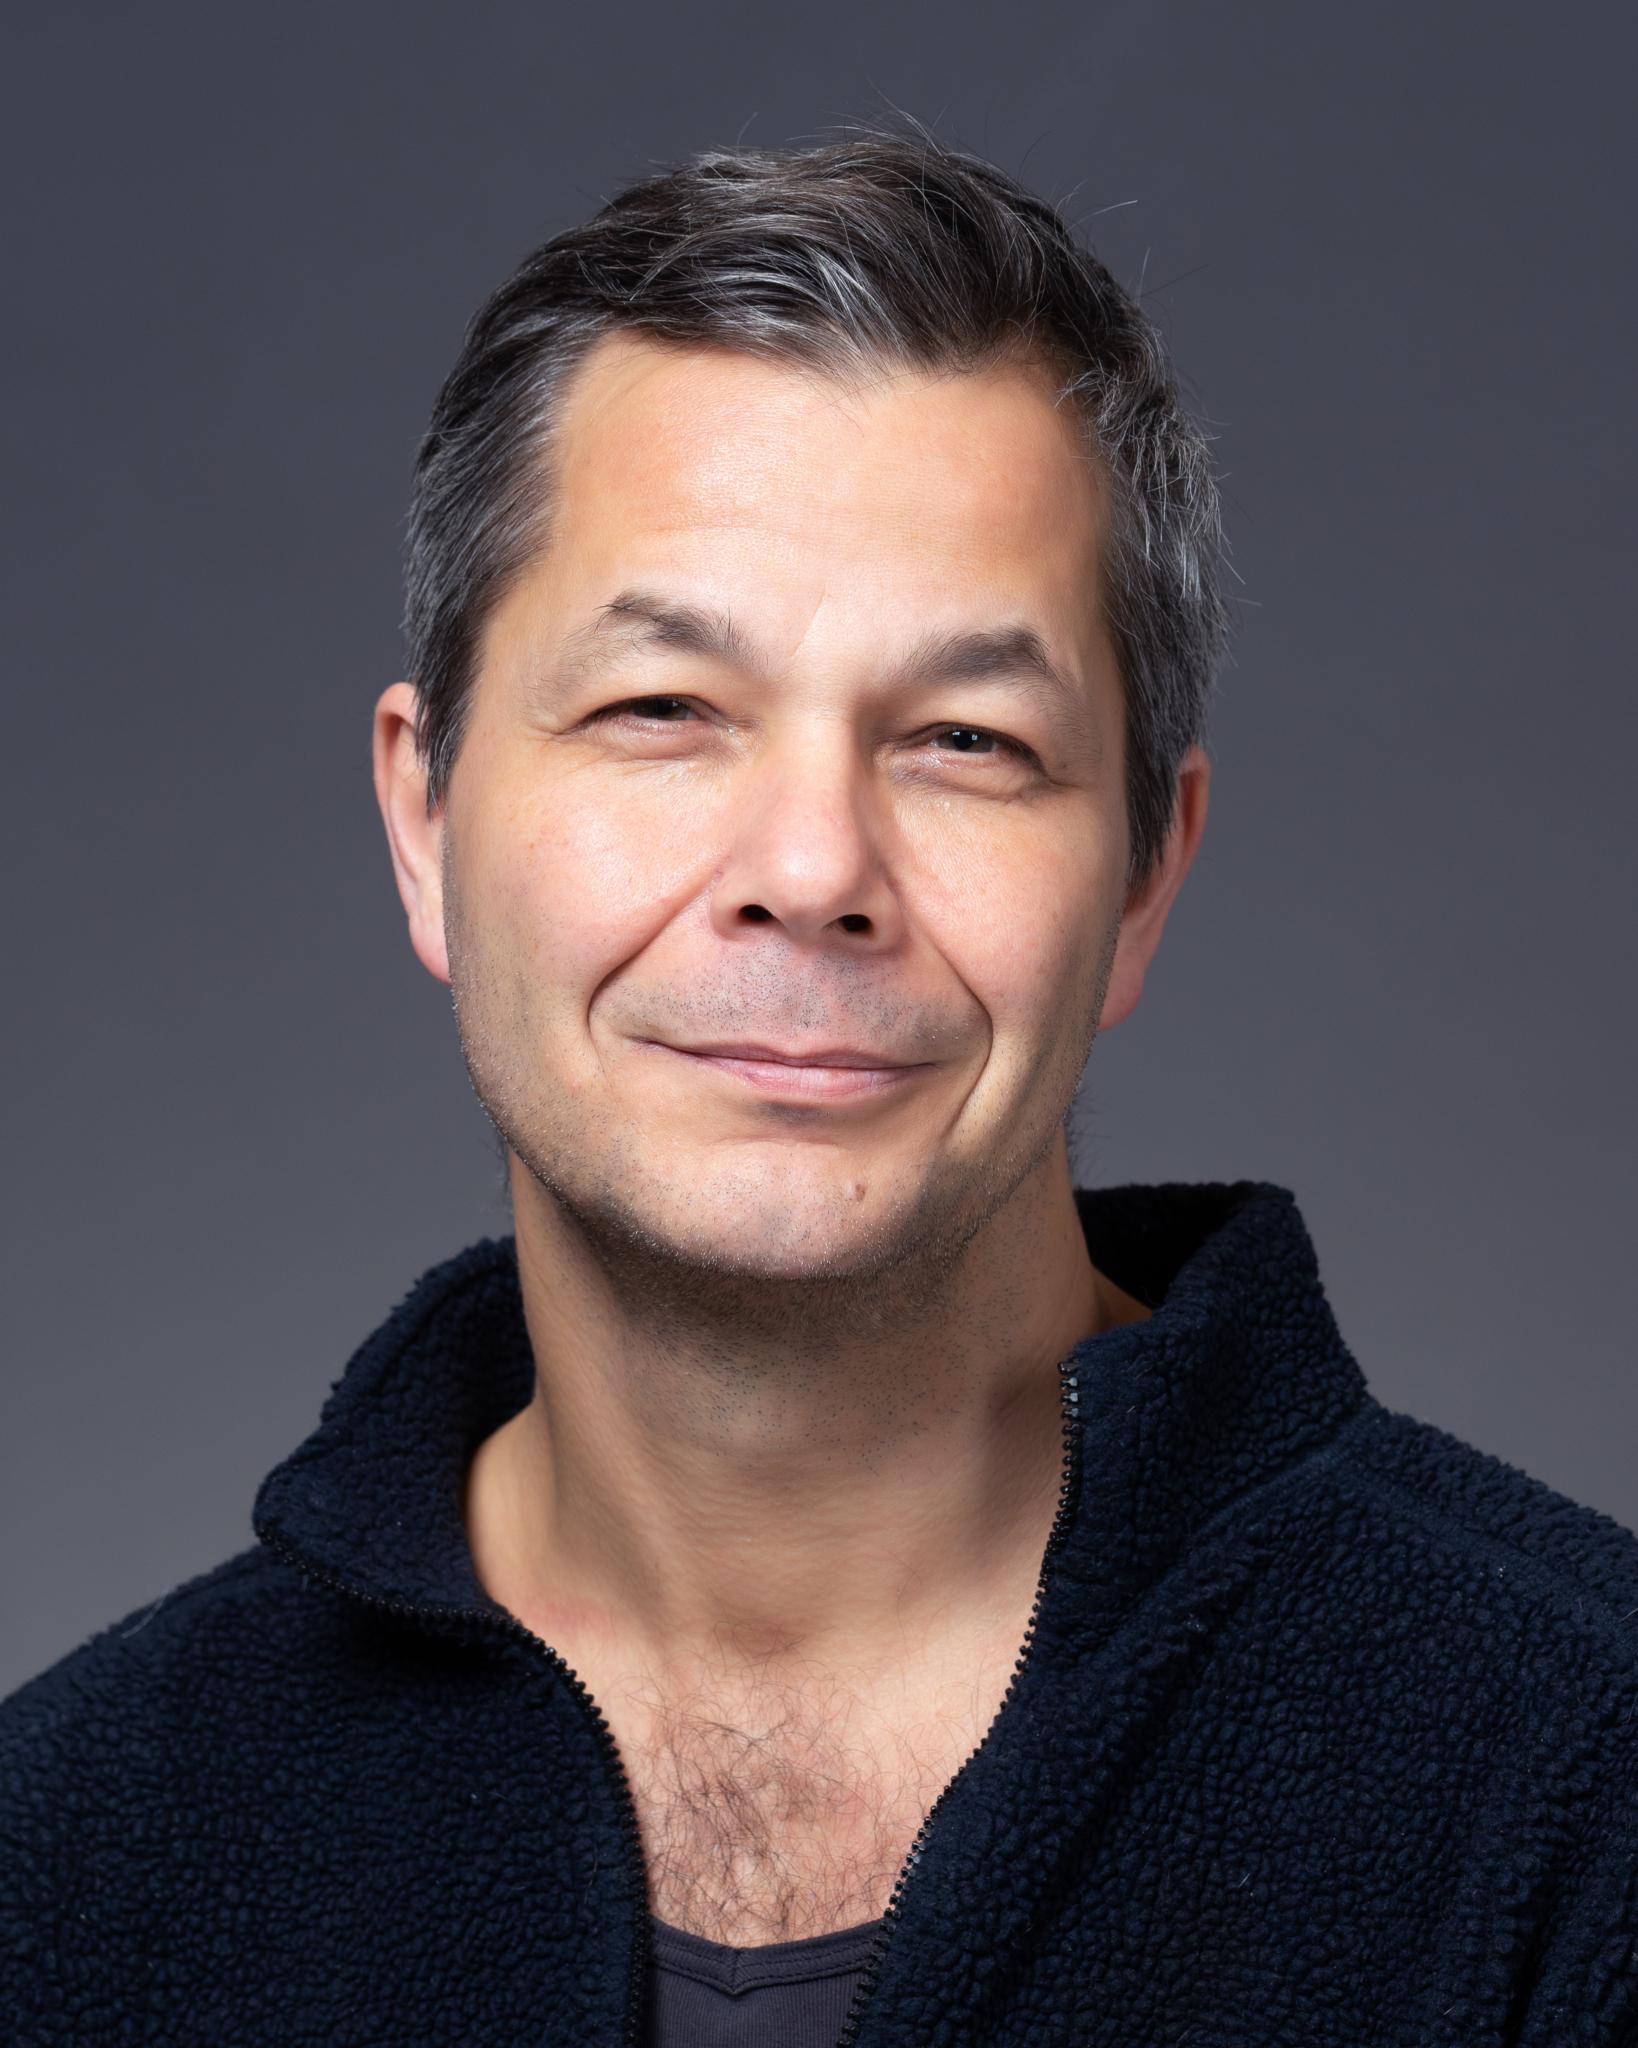 Henrik Gustafsson